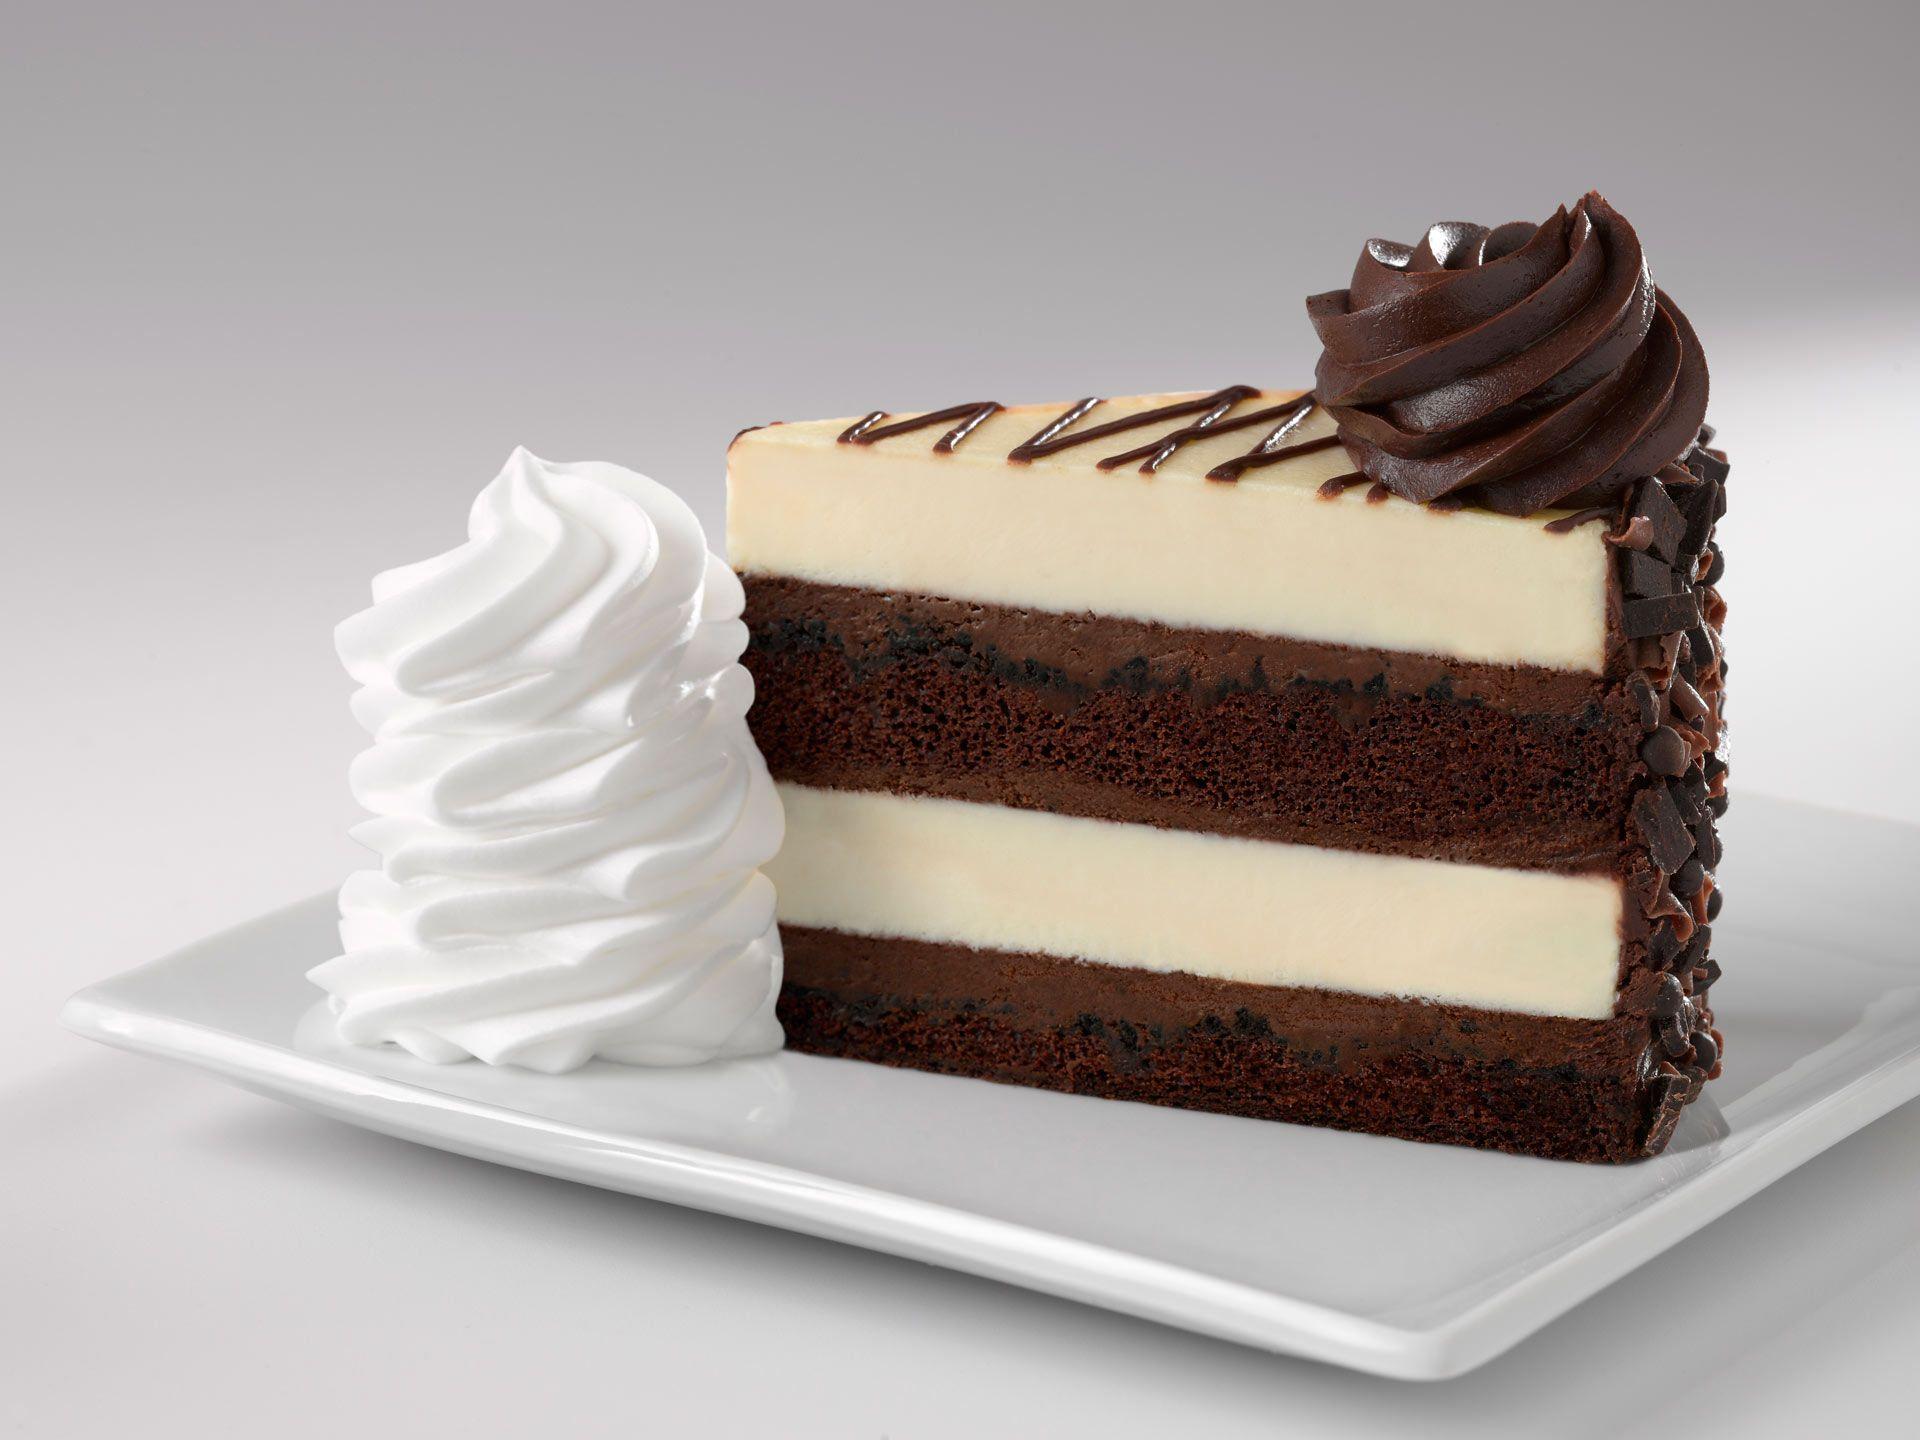 chocolate cheese cake pictures 30th Anniversary Chocolate Cake